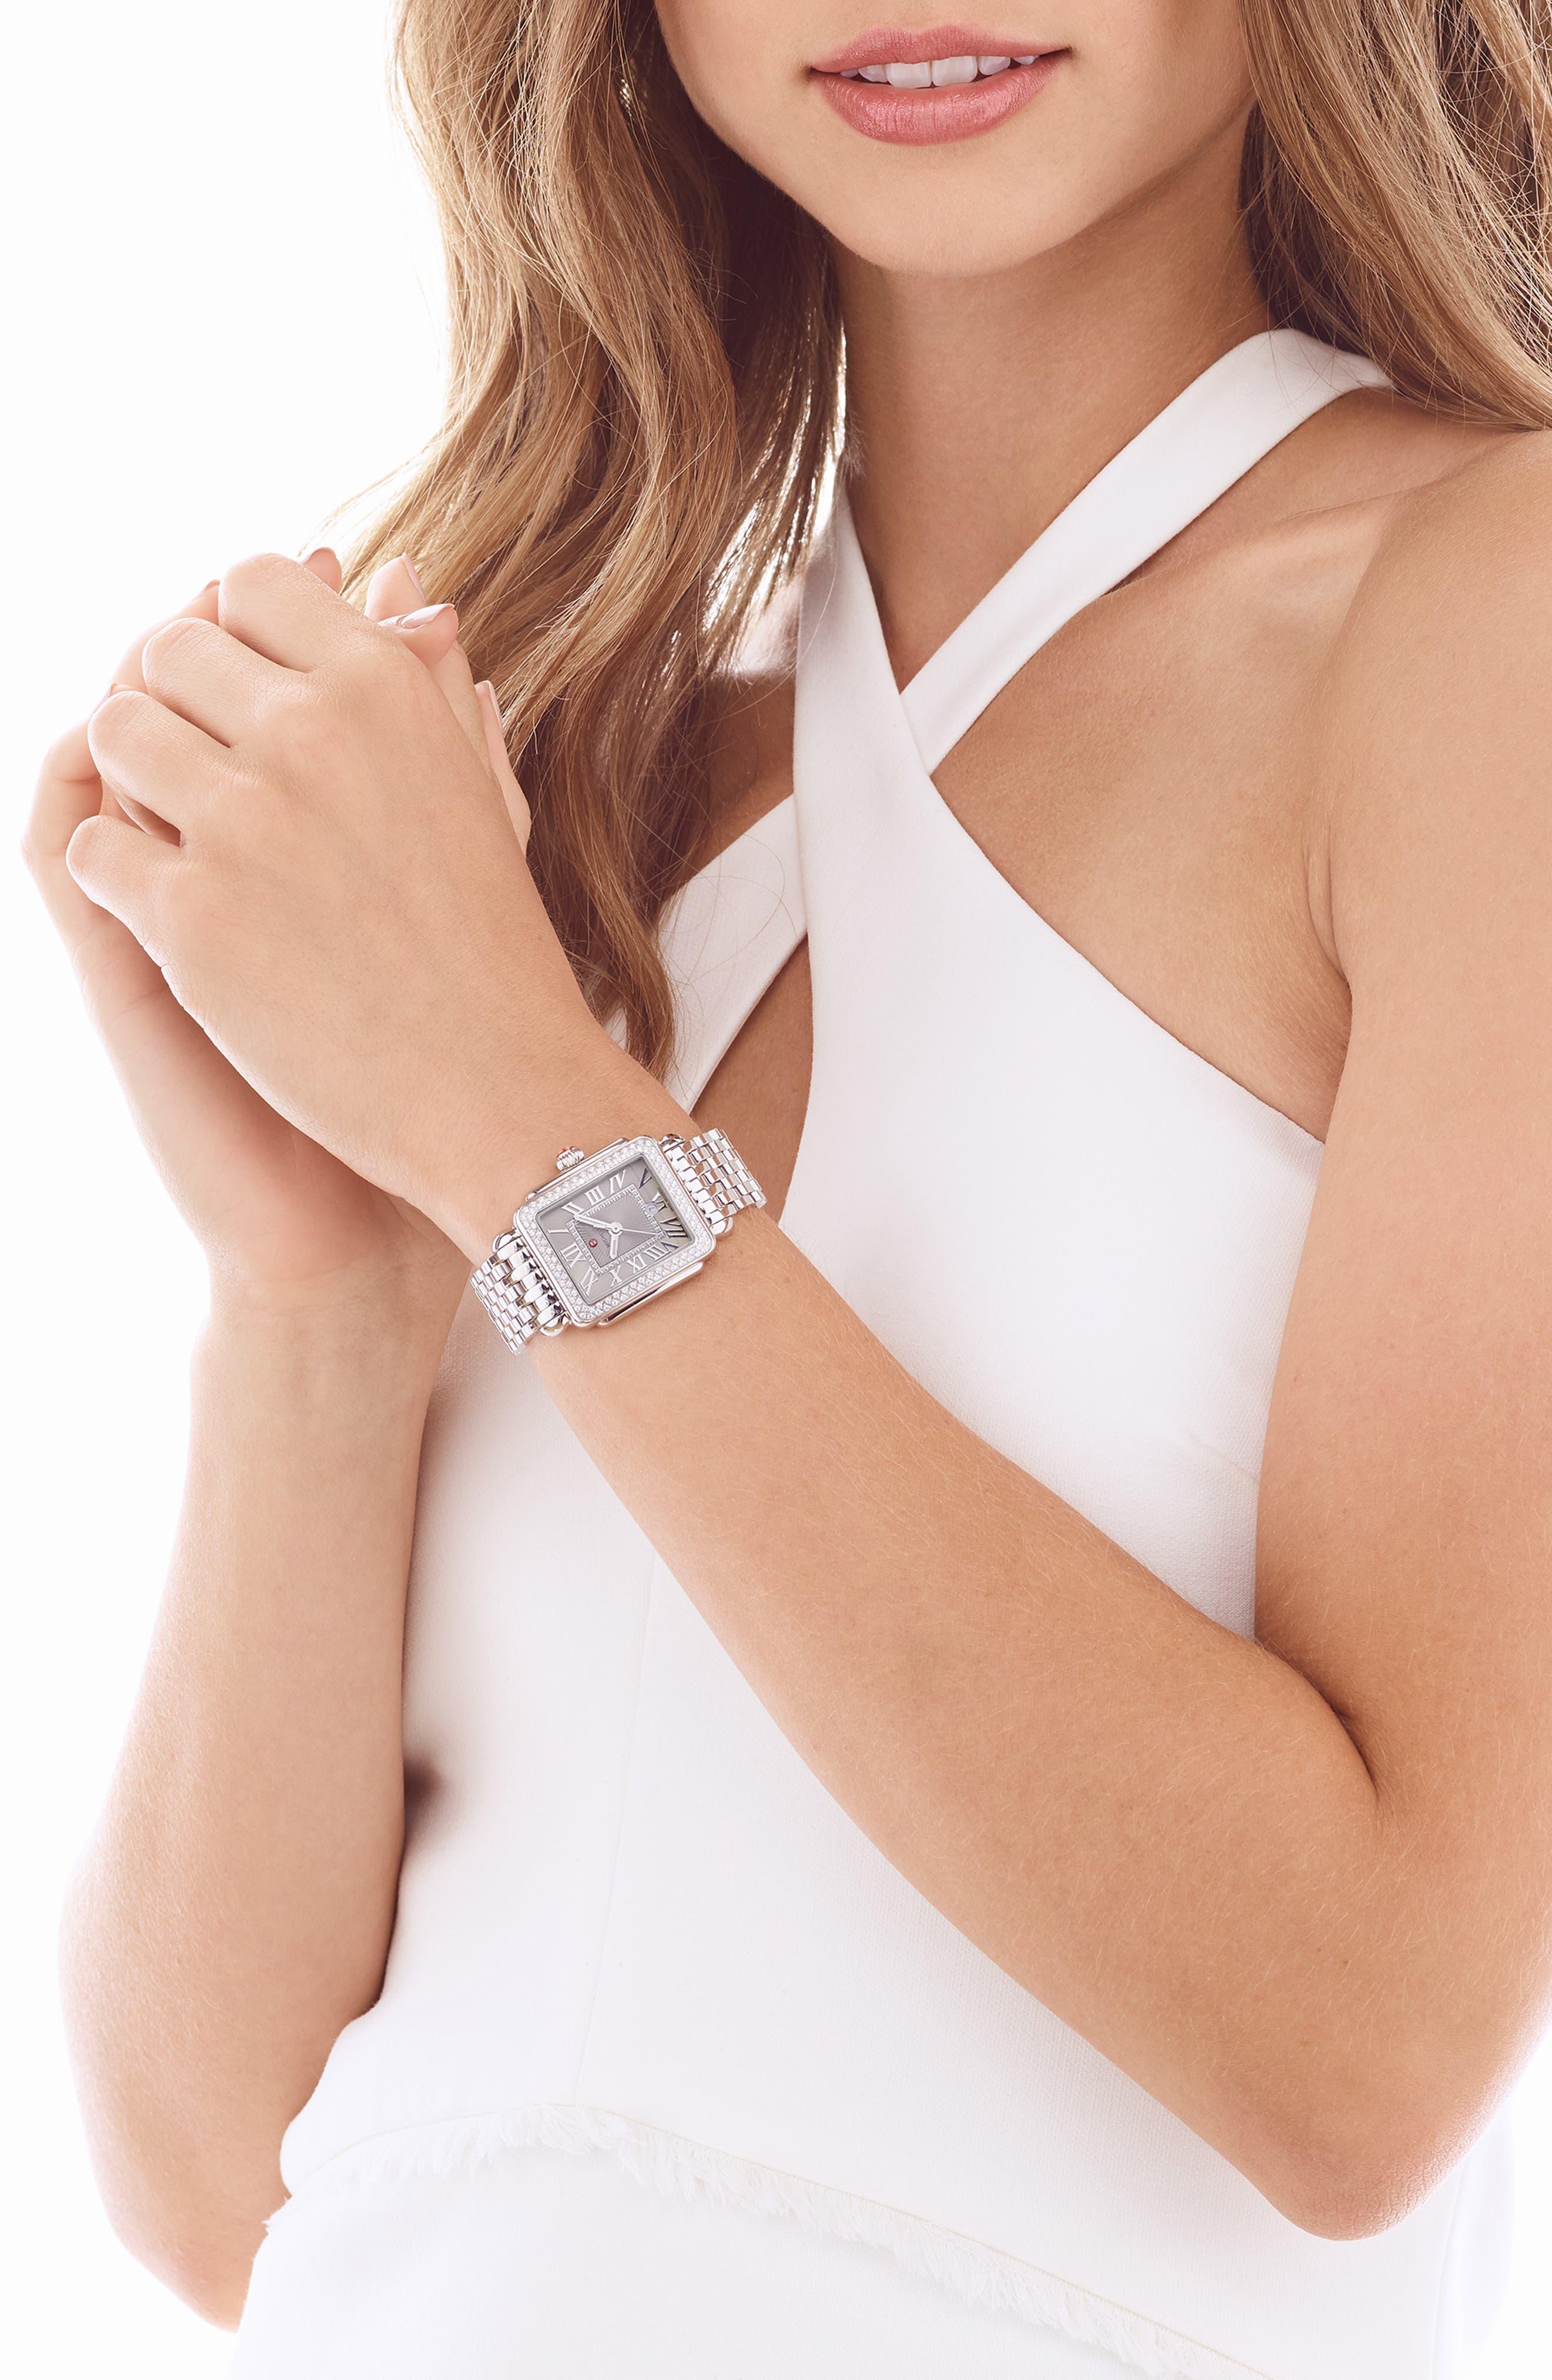 Deco 16 16mm Bracelet Watchband,                             Alternate thumbnail 9, color,                             SILVER